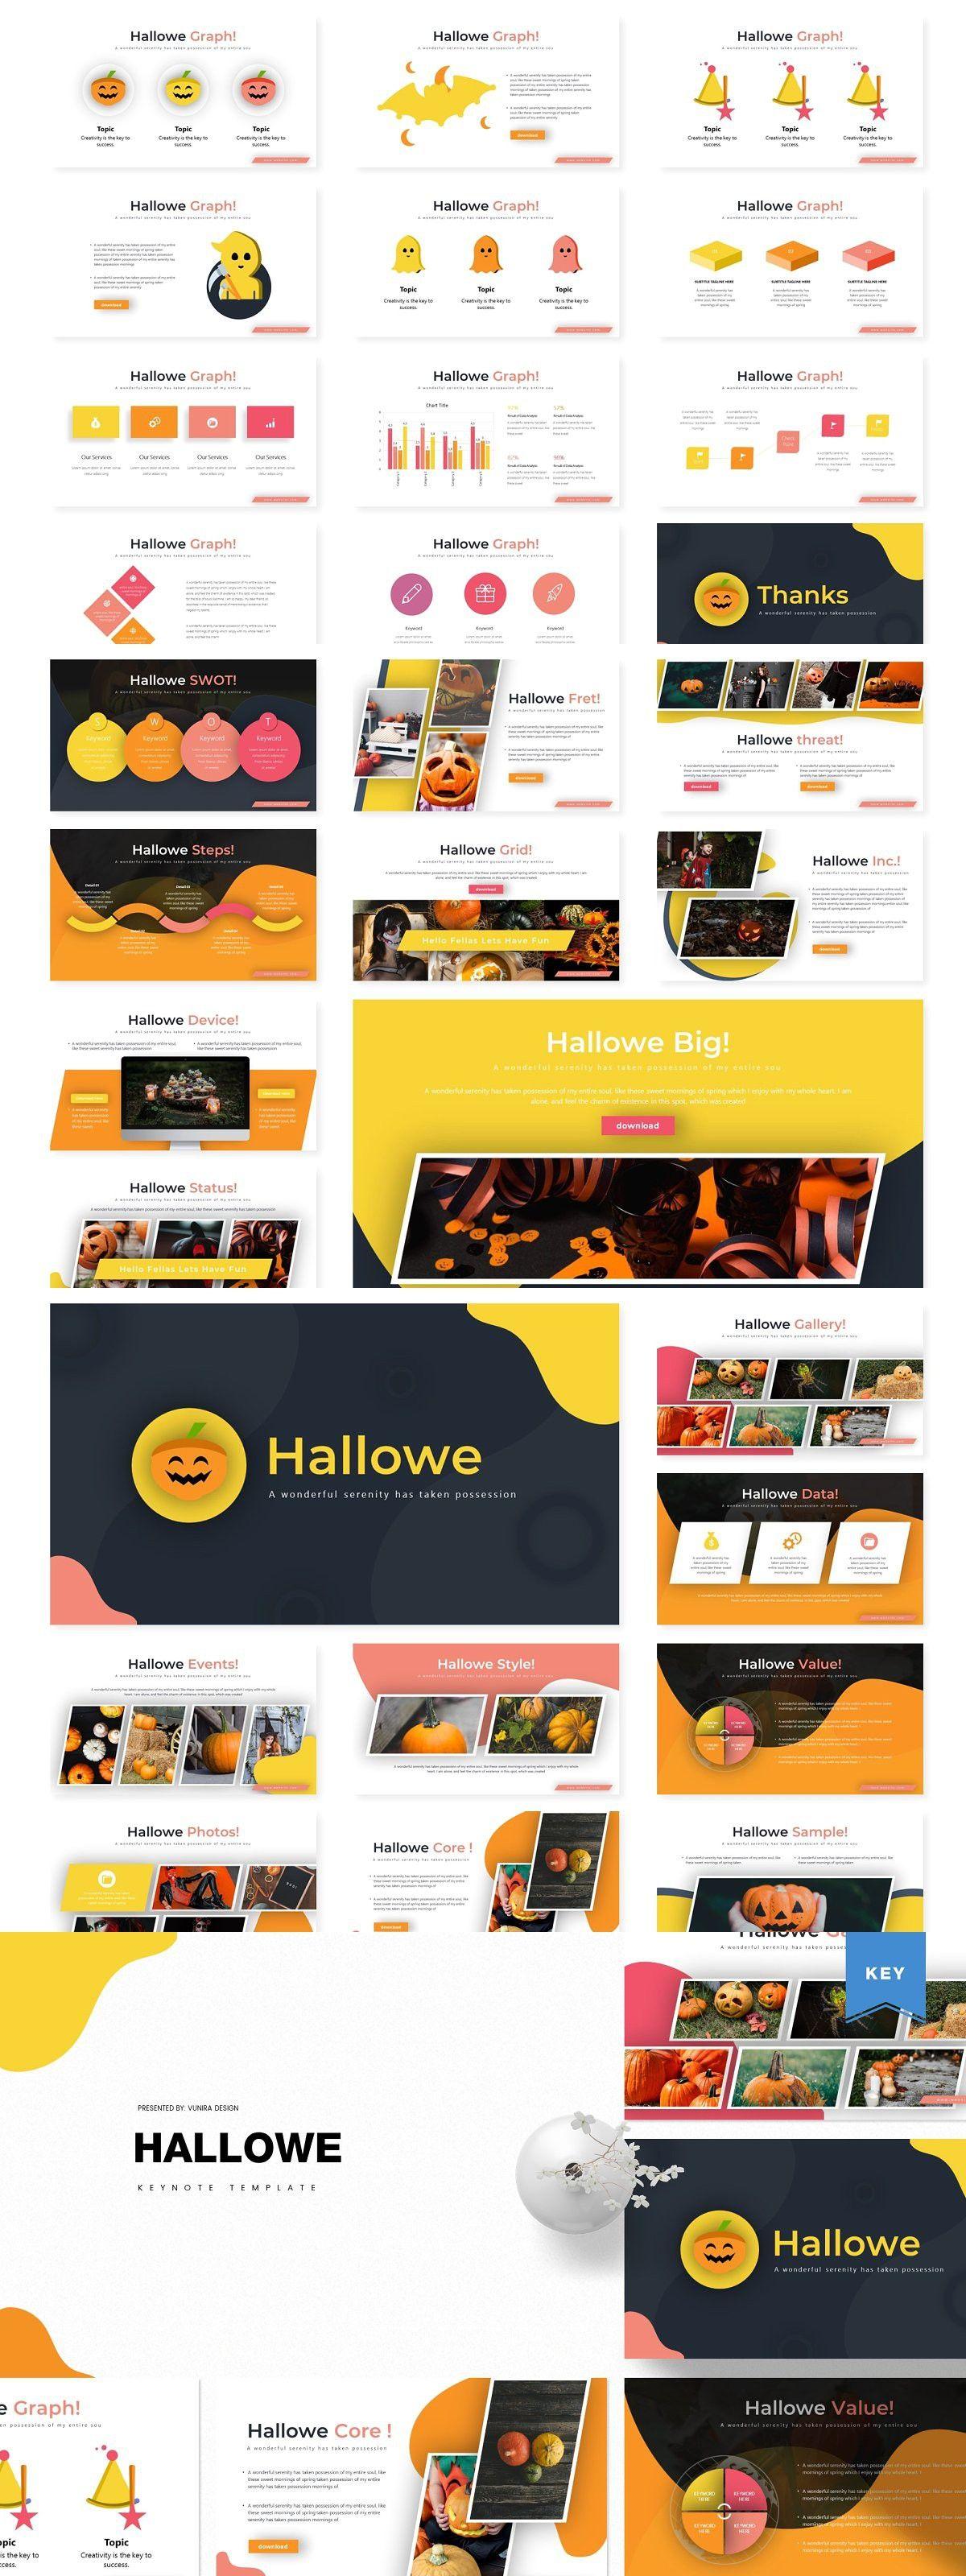 Hallowe KeynoteTemplate Google slides template